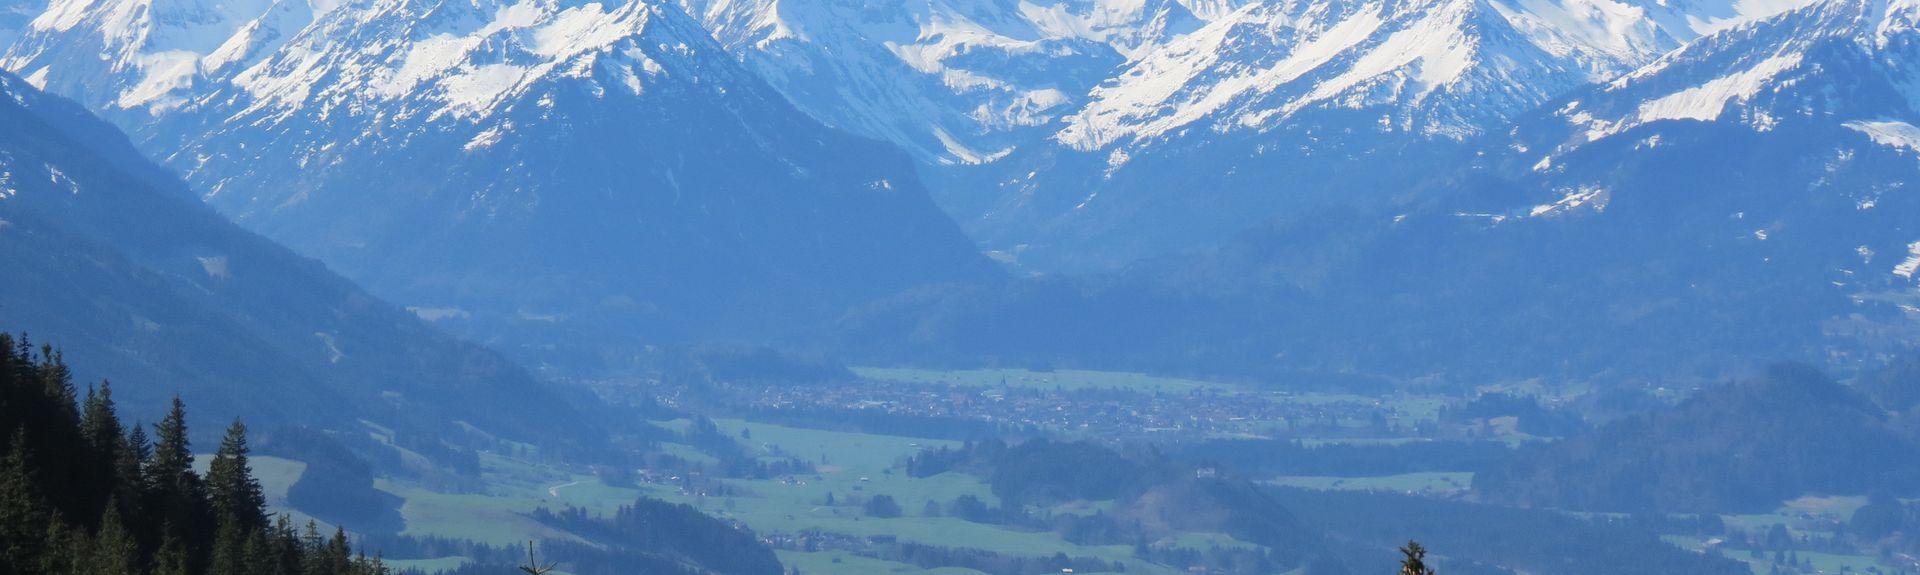 Obermaiselstein, Bavière, Allemagne